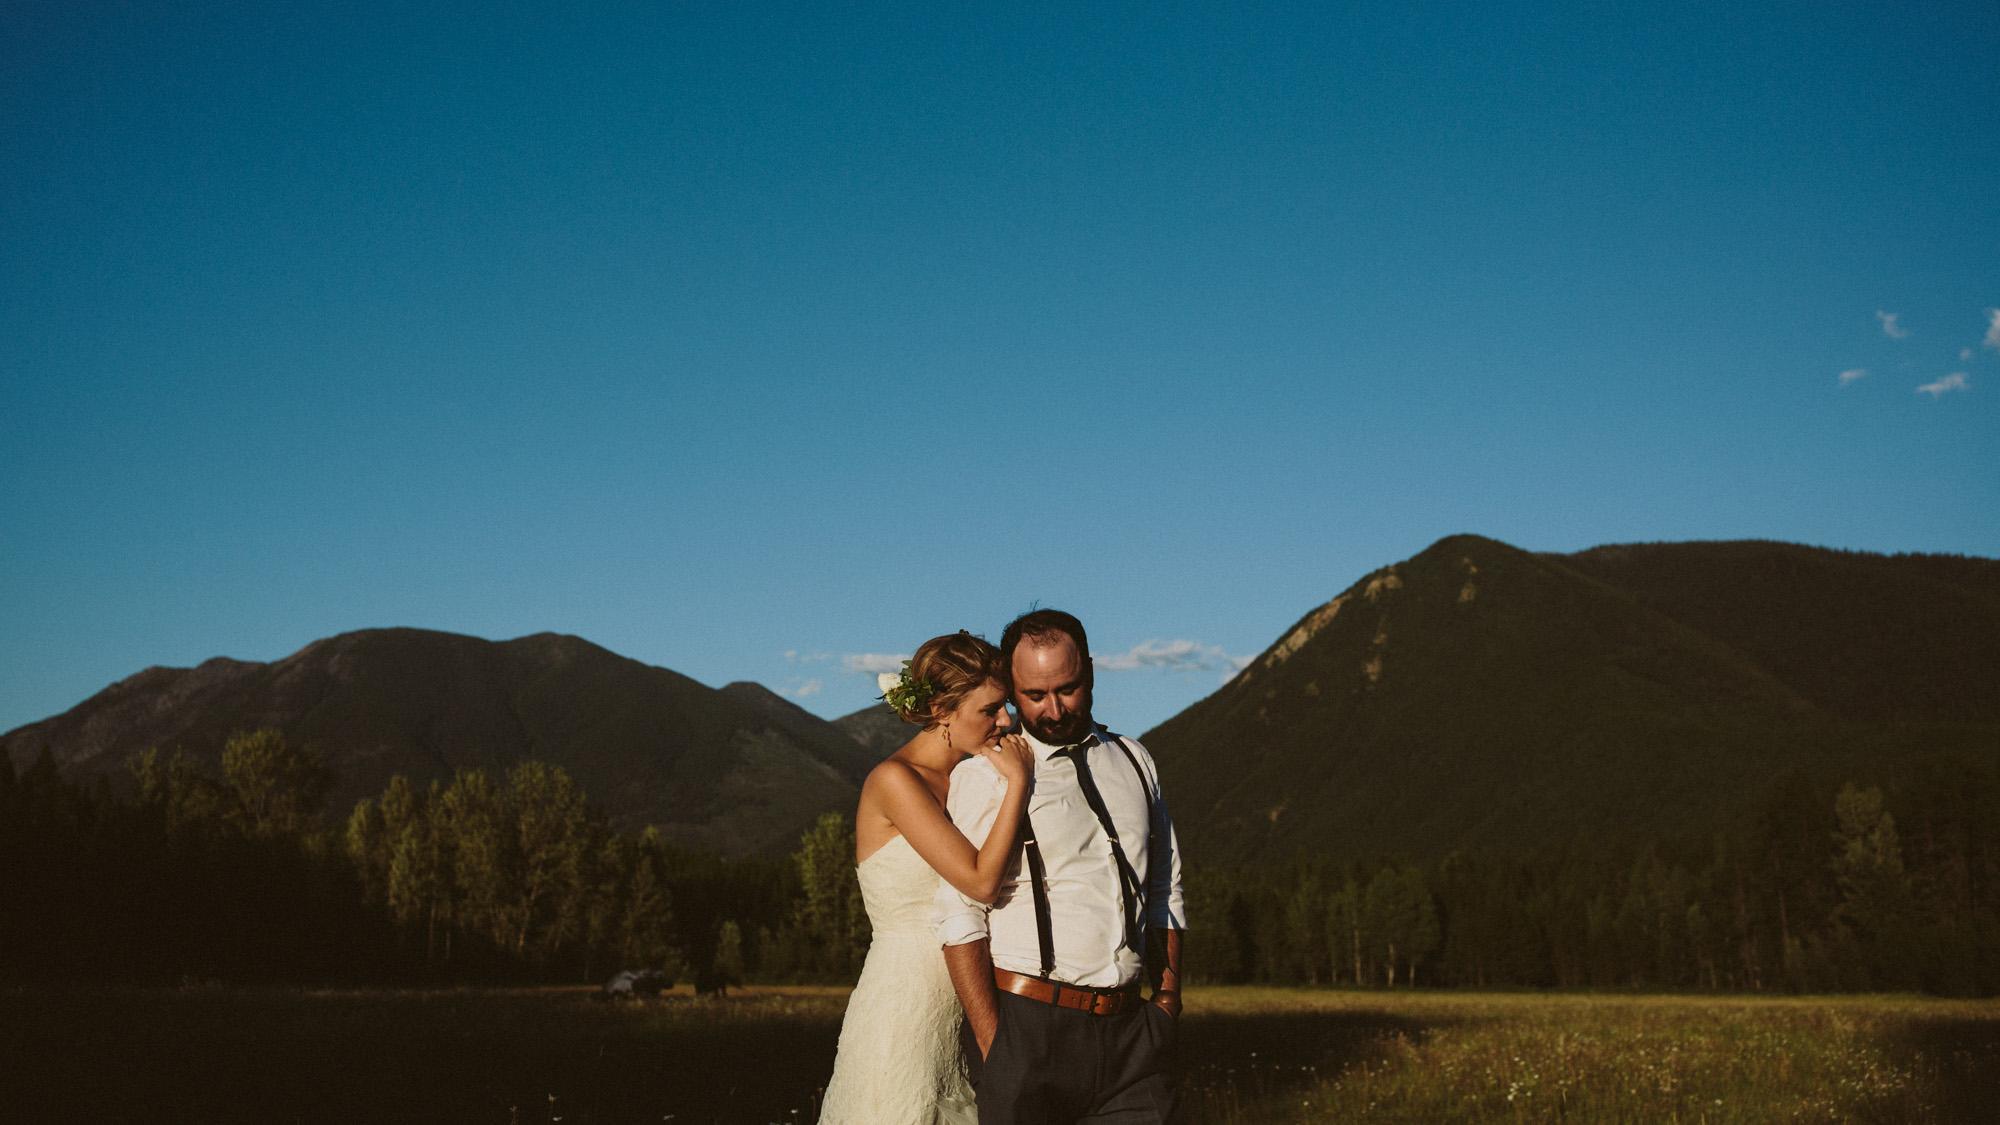 Montana_Wedding_Photos_alec_vanderboom-0127.jpg